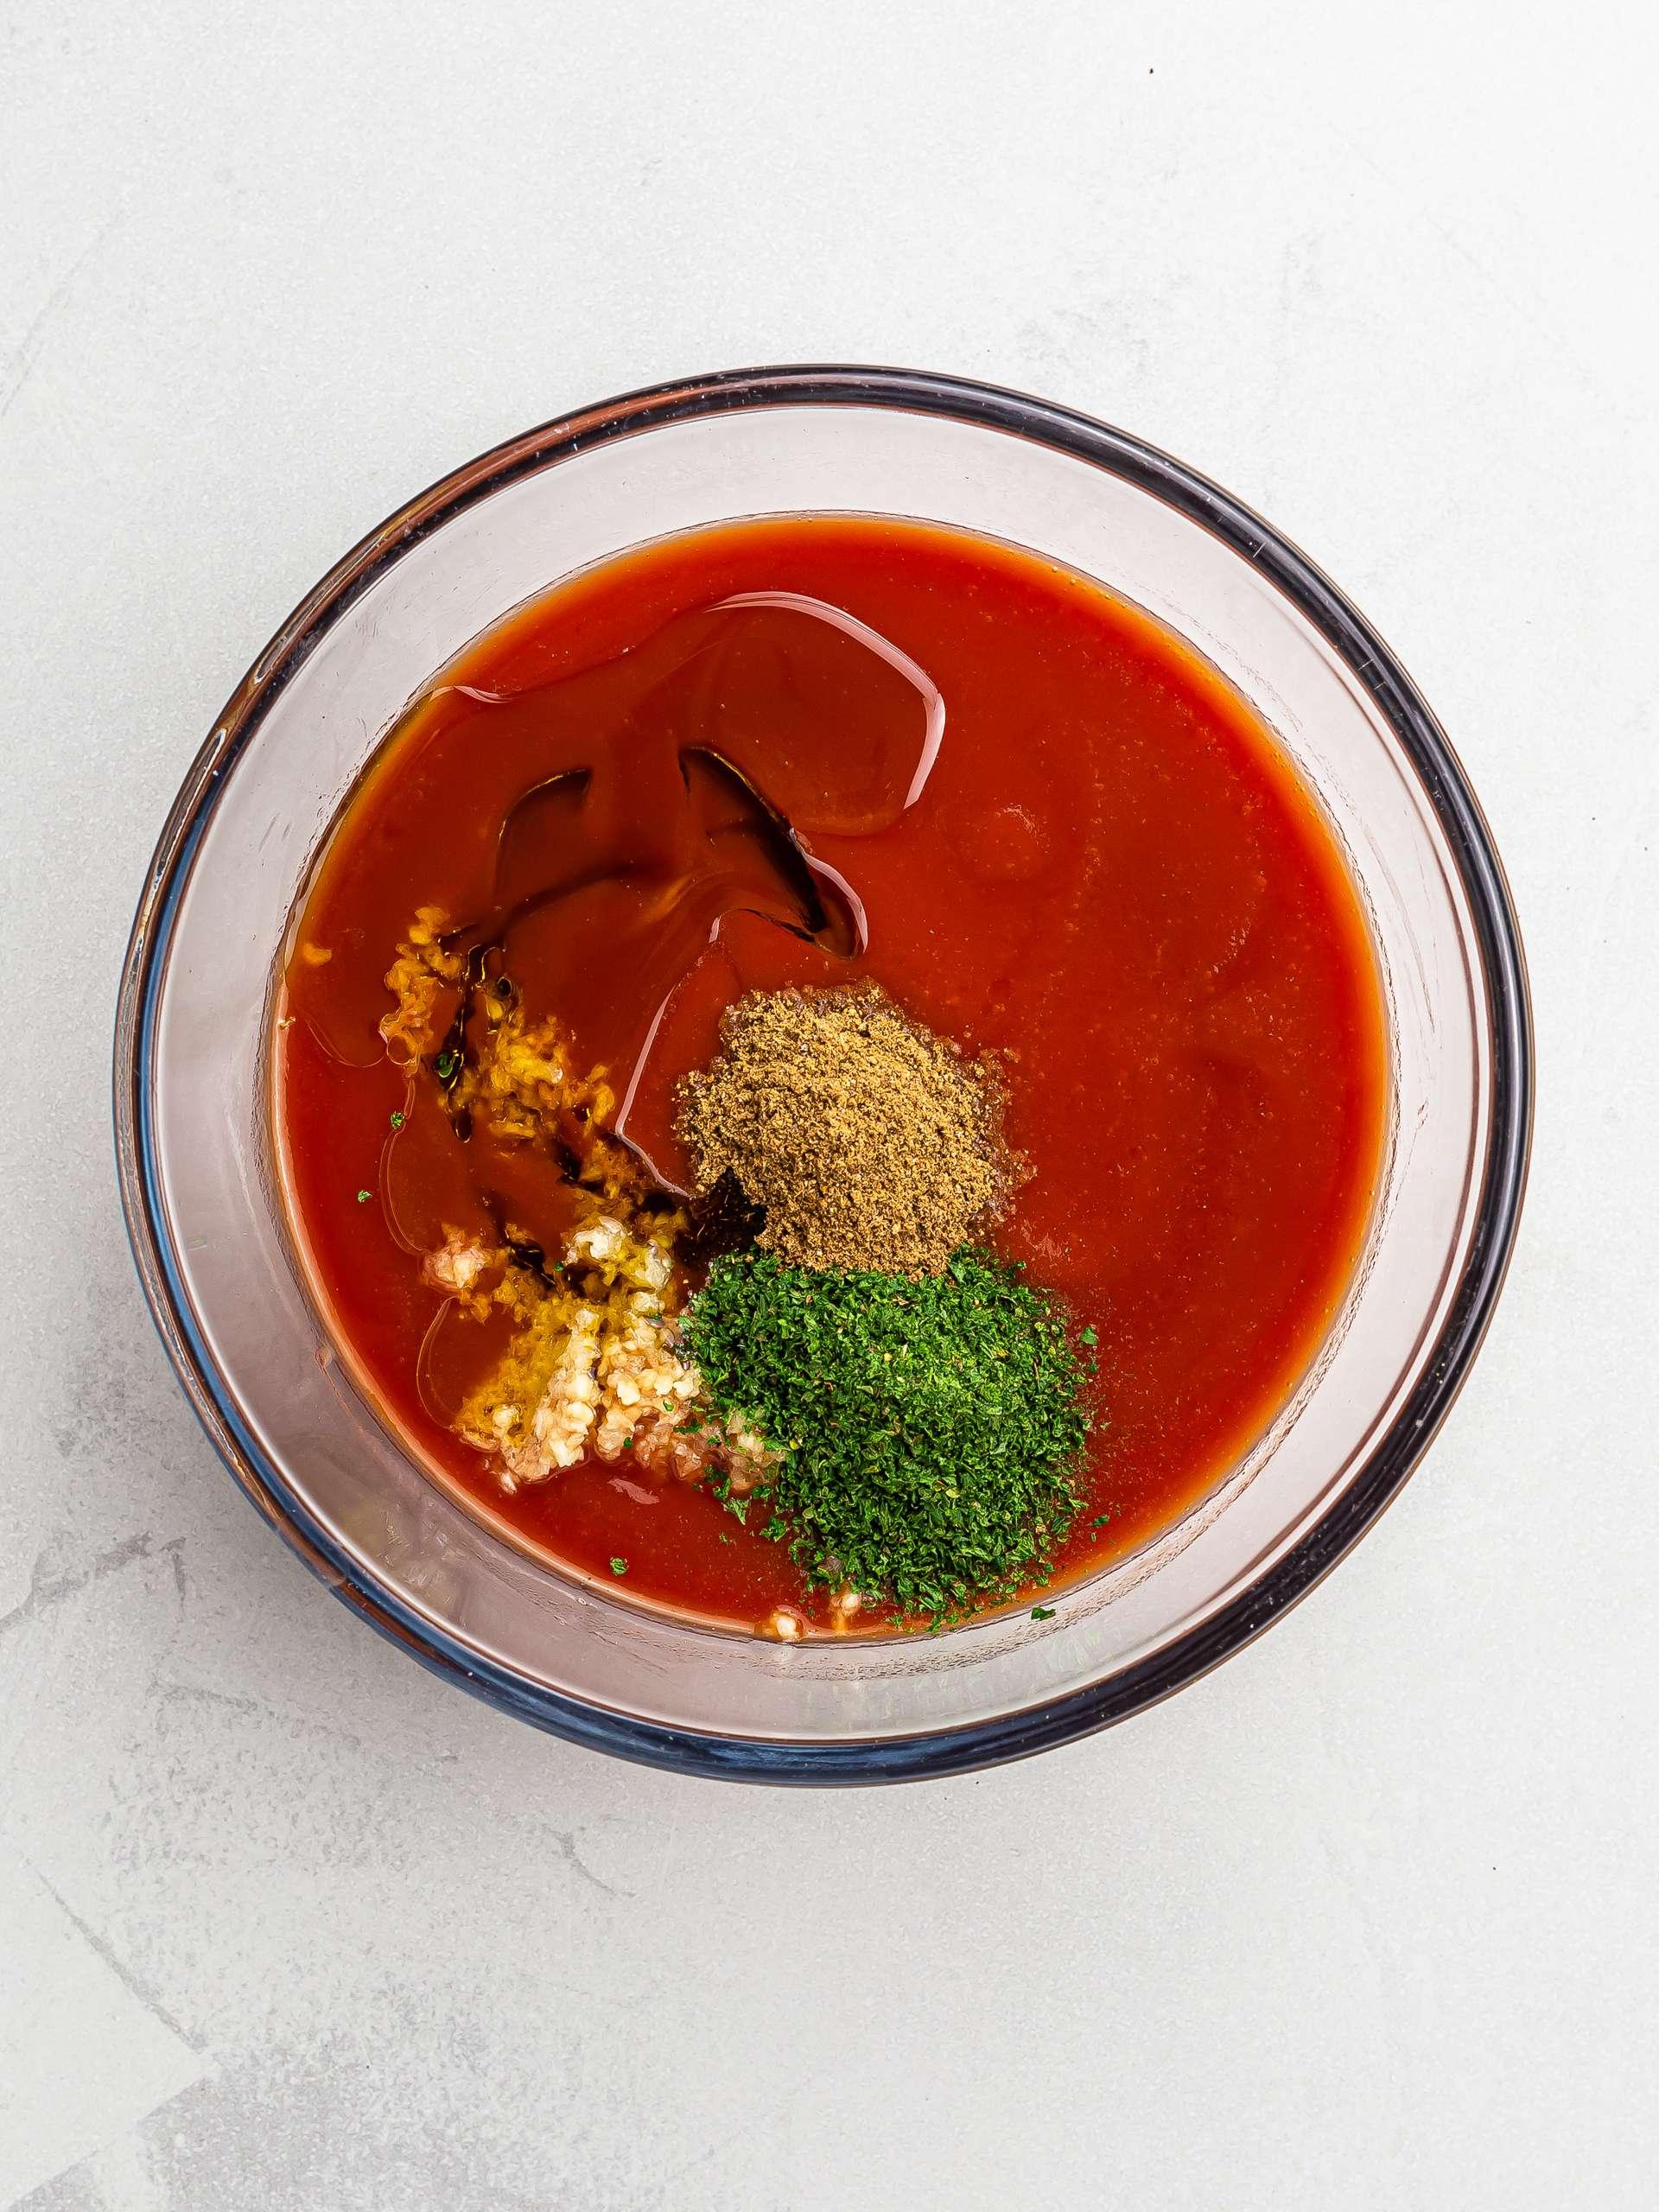 tomato sauce for lebanese moussaka